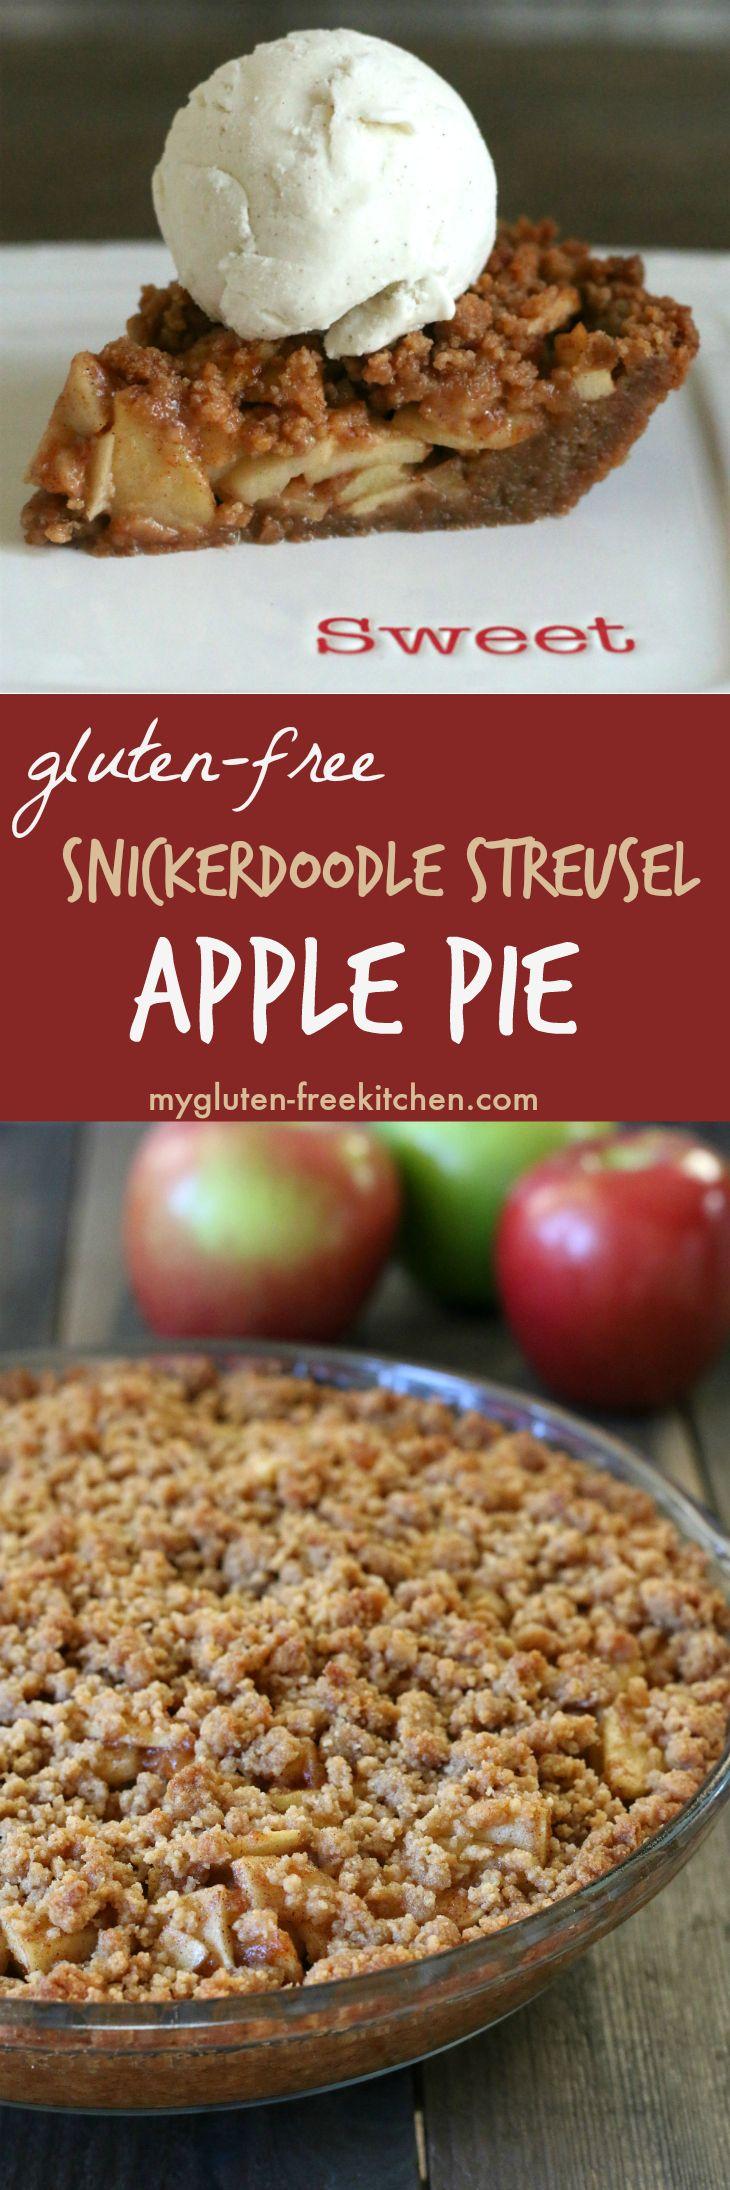 Gluten-free Apple Pie with Snickerdoodle Streusel. Amazing pie recipe!! I  never